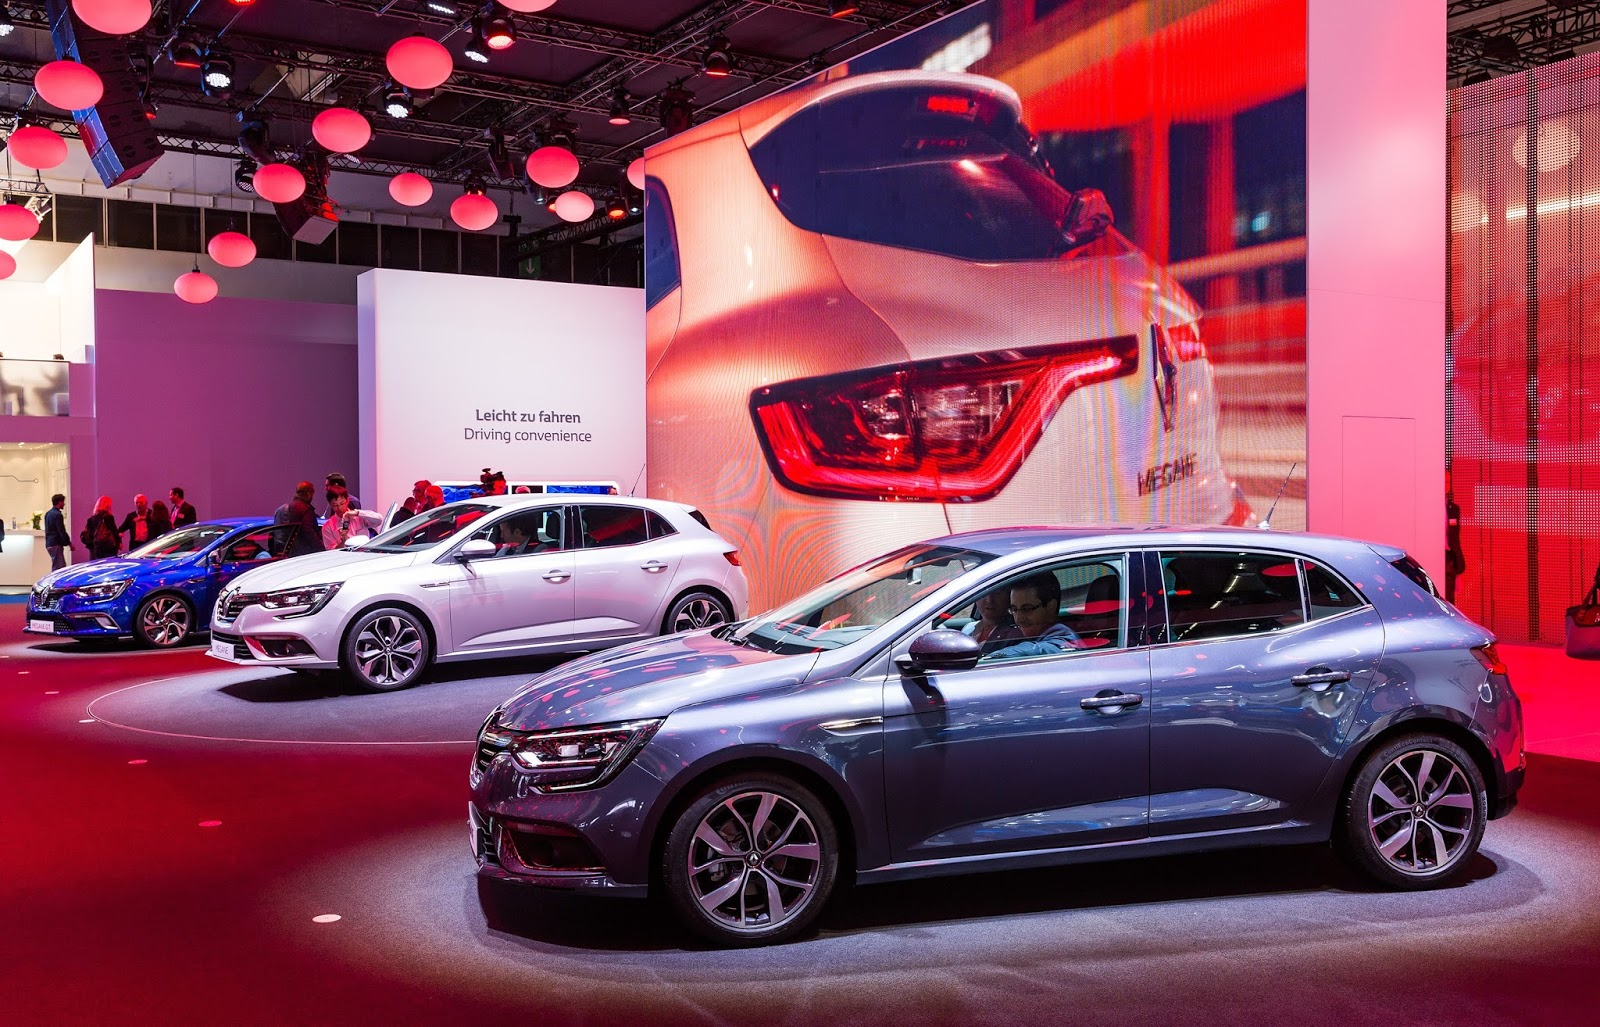 %25CE%259D%25CE%25AD%25CE%25BF Renault MEGANE Το νέο Renault Mégane παρουσιάστηκε στην διεθνή έκθεση της Φρανκφούρτης με έκδοση GT και 205 ίππους Renault, Renault Megane, Renault Talisman, Renault Talisman Estate, ΣΑΛΟΝΙ ΑΥΤΟΚΙΝΗΤΟΥΦΡΑΝΚΦΟΥΡΤΗΣ 2015